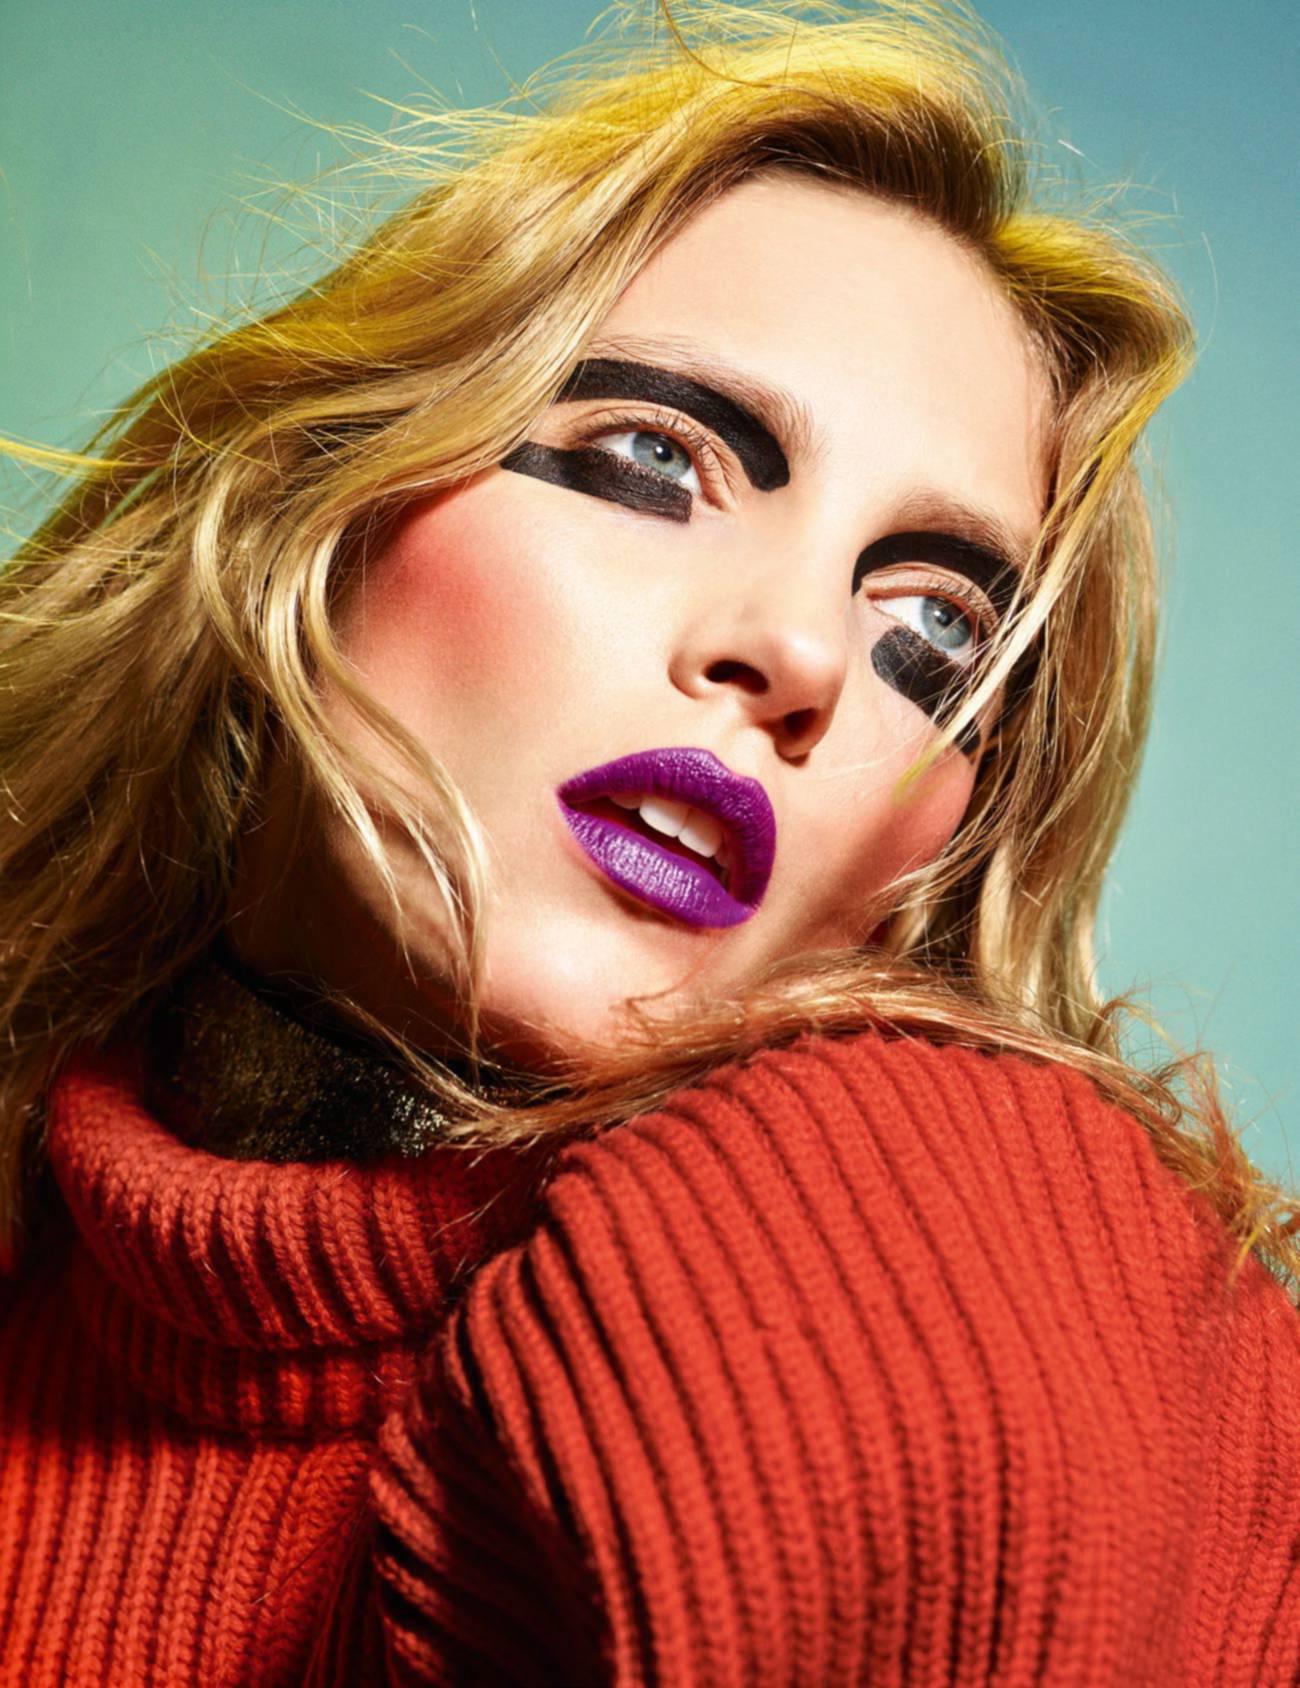 Vogue_Paris-August_2016-02-Anja_Rubik-by-Mario_Sorrenti-1